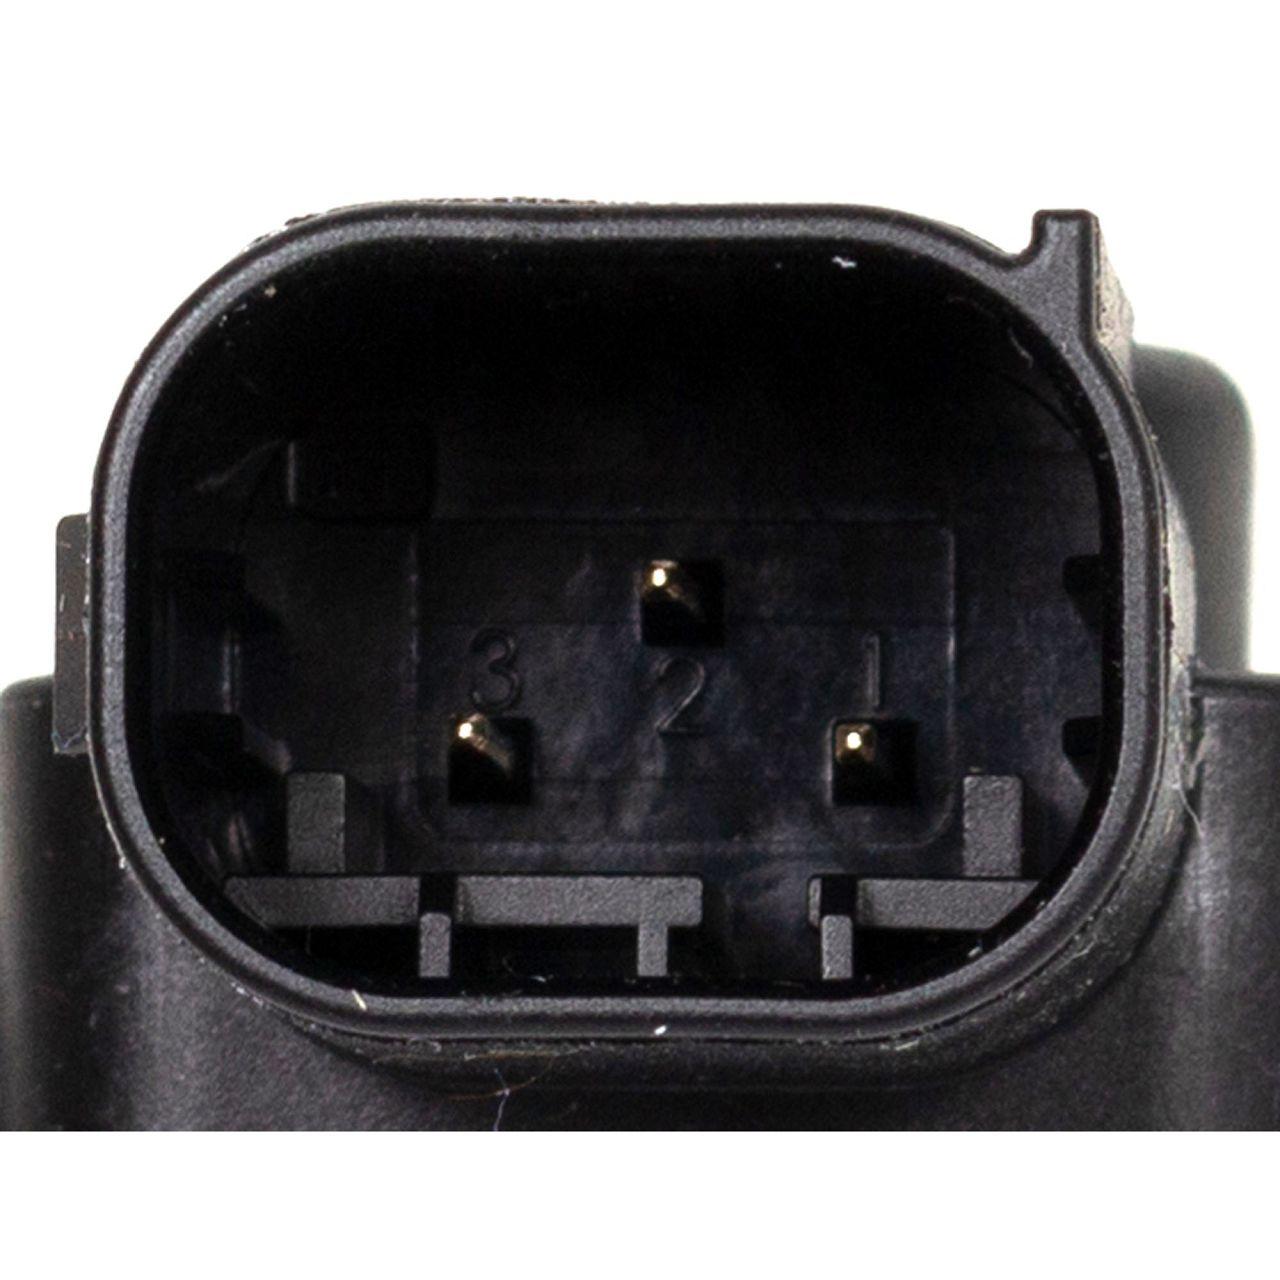 BOSCH 0261230189 Sensor Saugrohrdruck Ladedrucksensor 3 Pin für MERCEDES W168 W169 W203